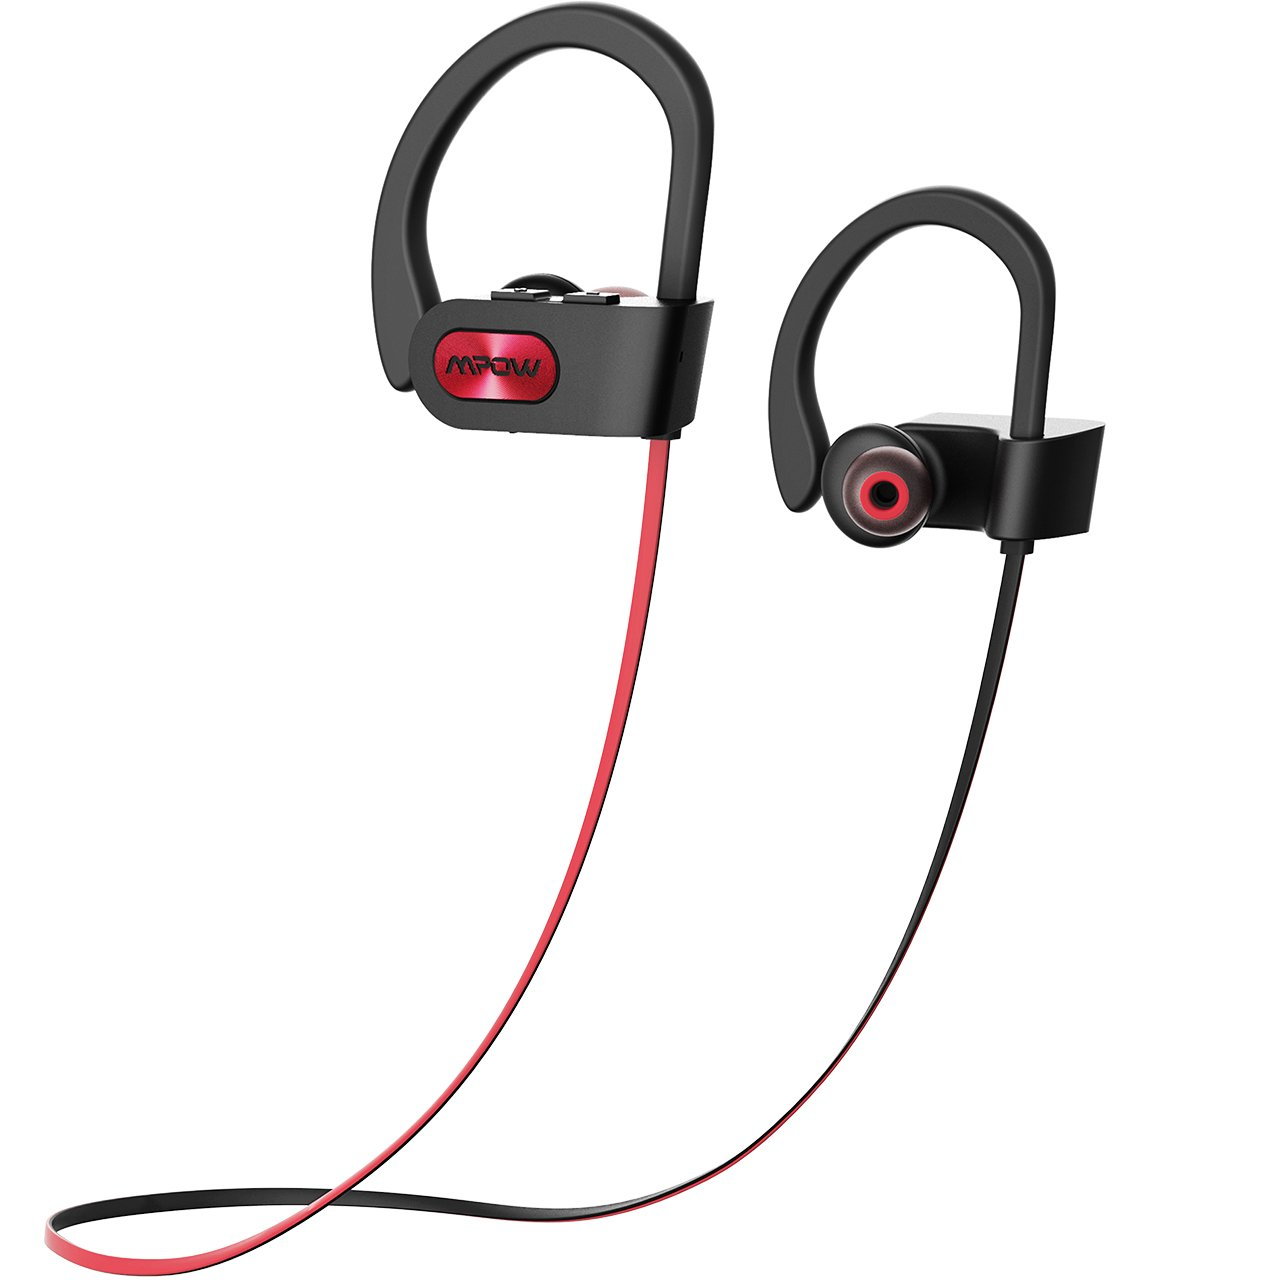 Auricolari Sport Mpow Auricolari Bluetooth IPX7 Impermeabile Bluetooth 4.1 Cuffie Sport, In-Ear Auricolari Sport AptX, Cuffie Sport Bluetooth A2DP Impermeabile, CVC 6.0 Cancellazione del Rumore, Auricolari Sport Bluetooth con EVA Borsa per iPhone 7, 7 Plus, 6s, 6s Plus, 6, 6 Plus, Samsung, Huawei, Sony ed Altri Smartphone